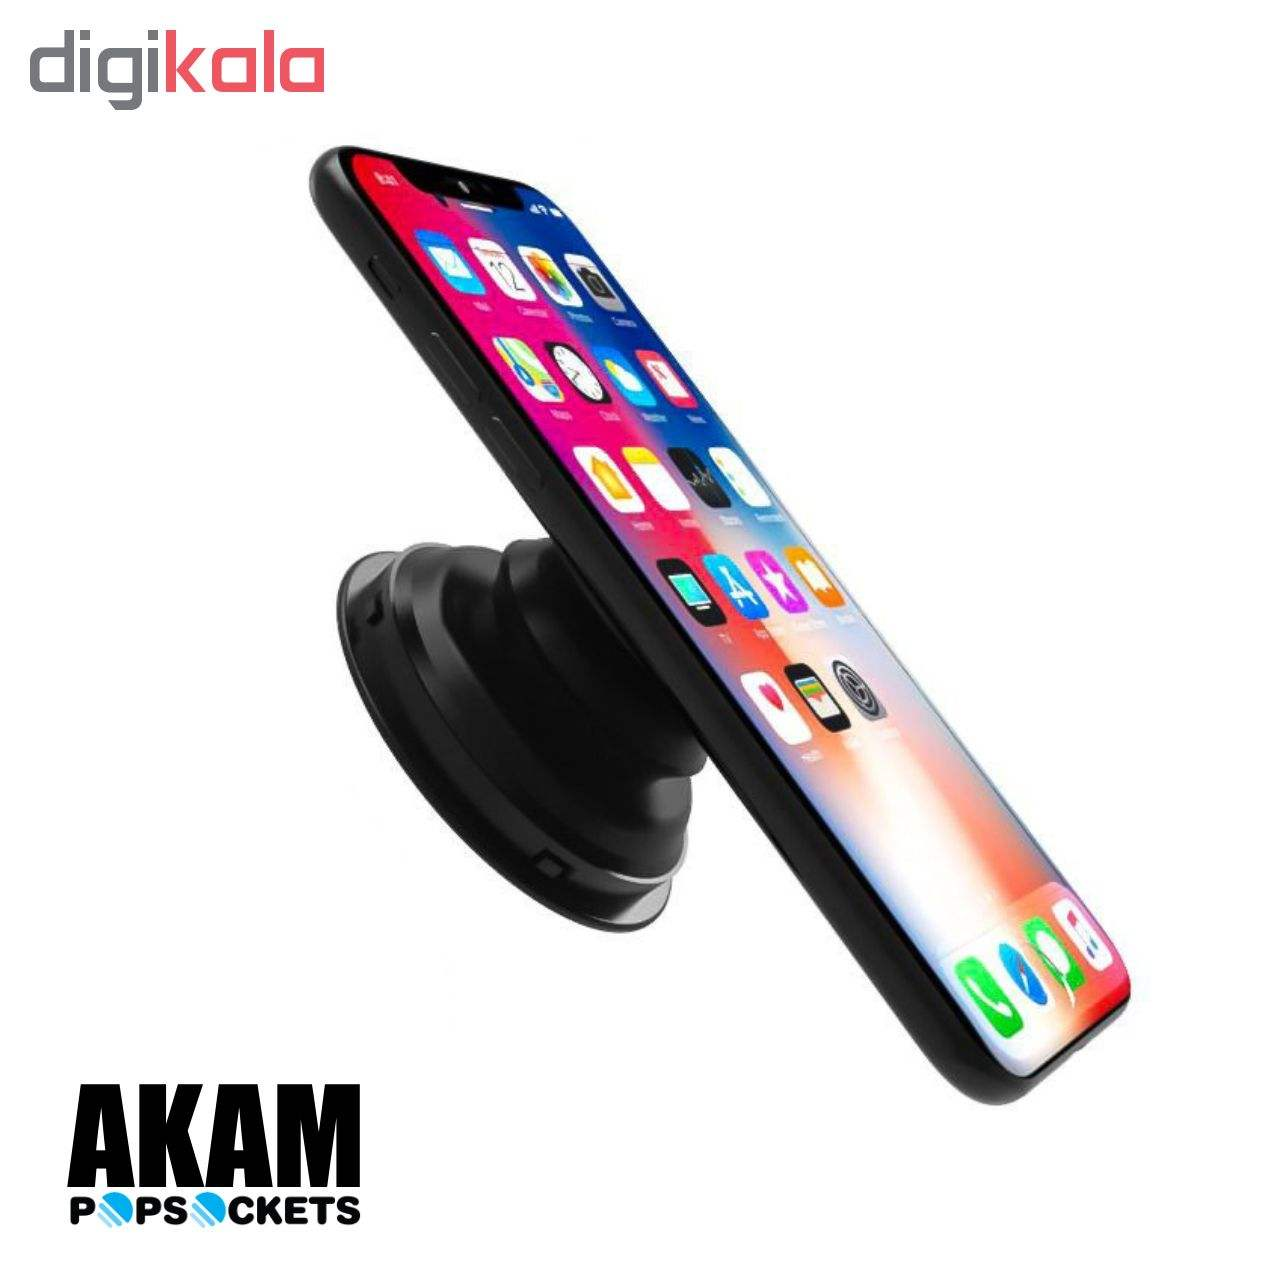 پایه نگهدارنده گوشی موبایل پاپ سوکت آکام مدل APS0033 main 1 7